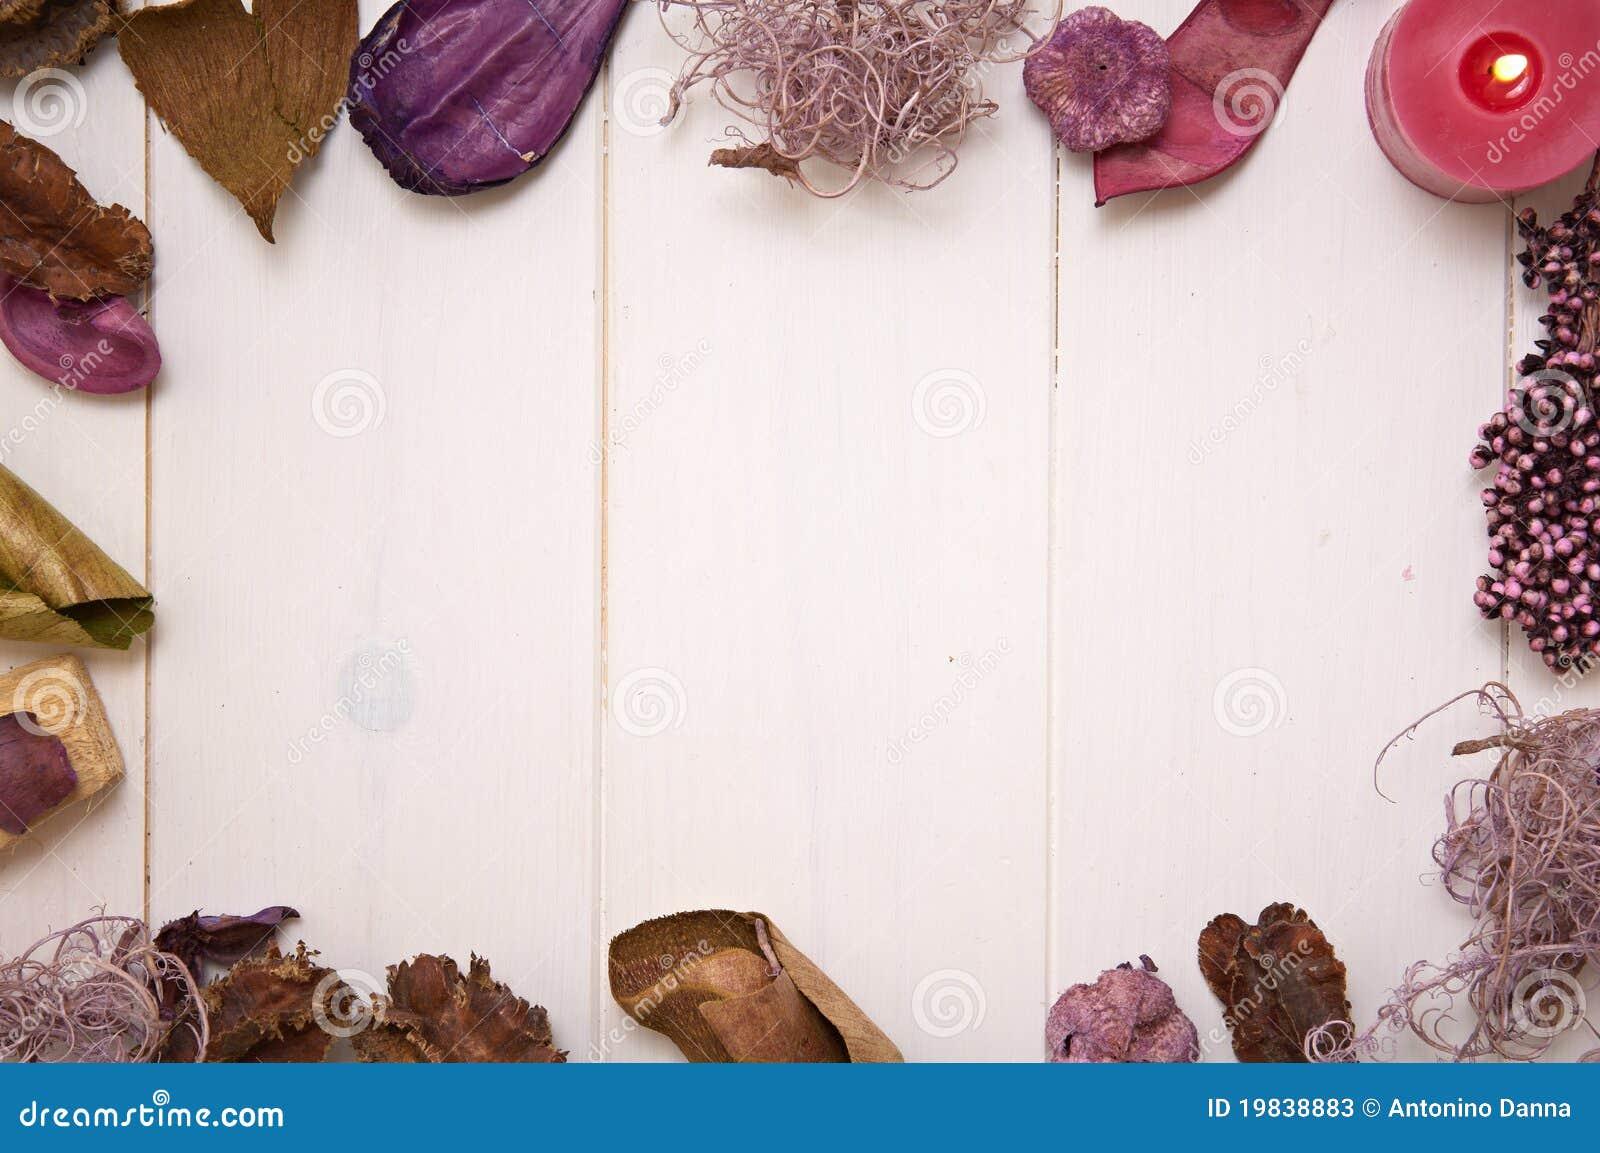 potpourri frame wallpaper stock photos